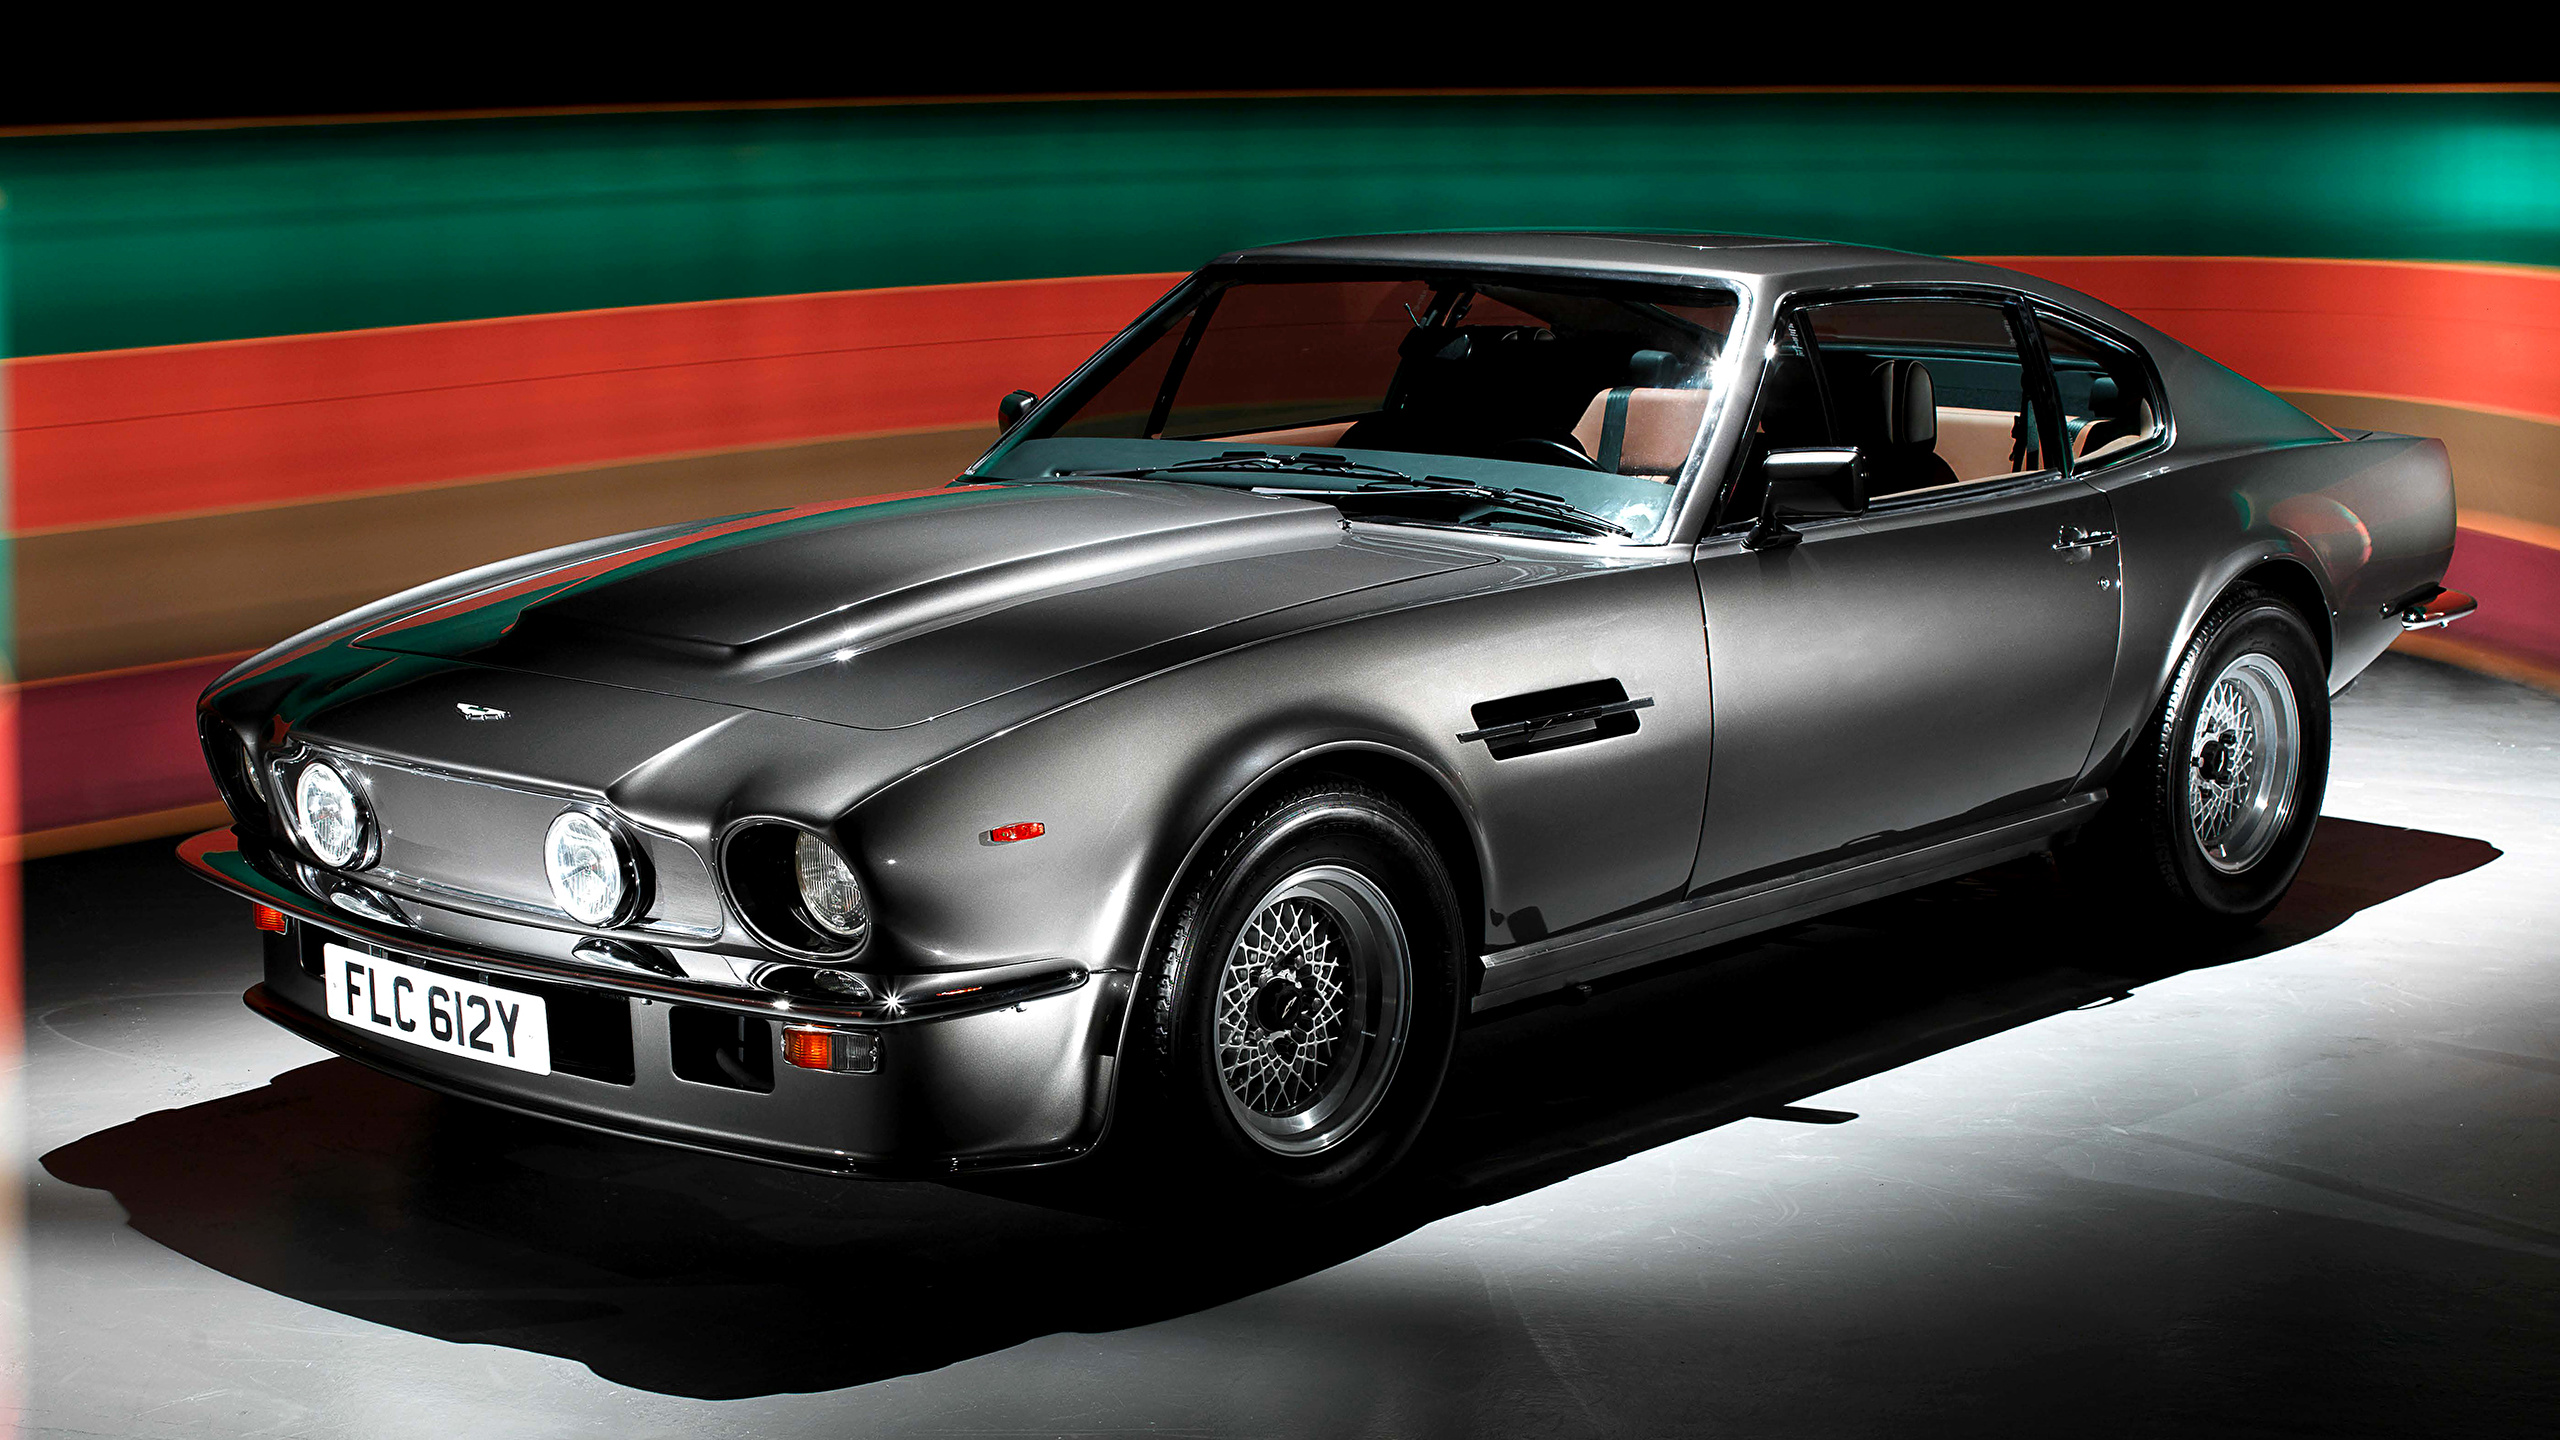 Photo Aston Martin 1987 89 V8 Vantage X Pack Gray Vintage 2560x1440